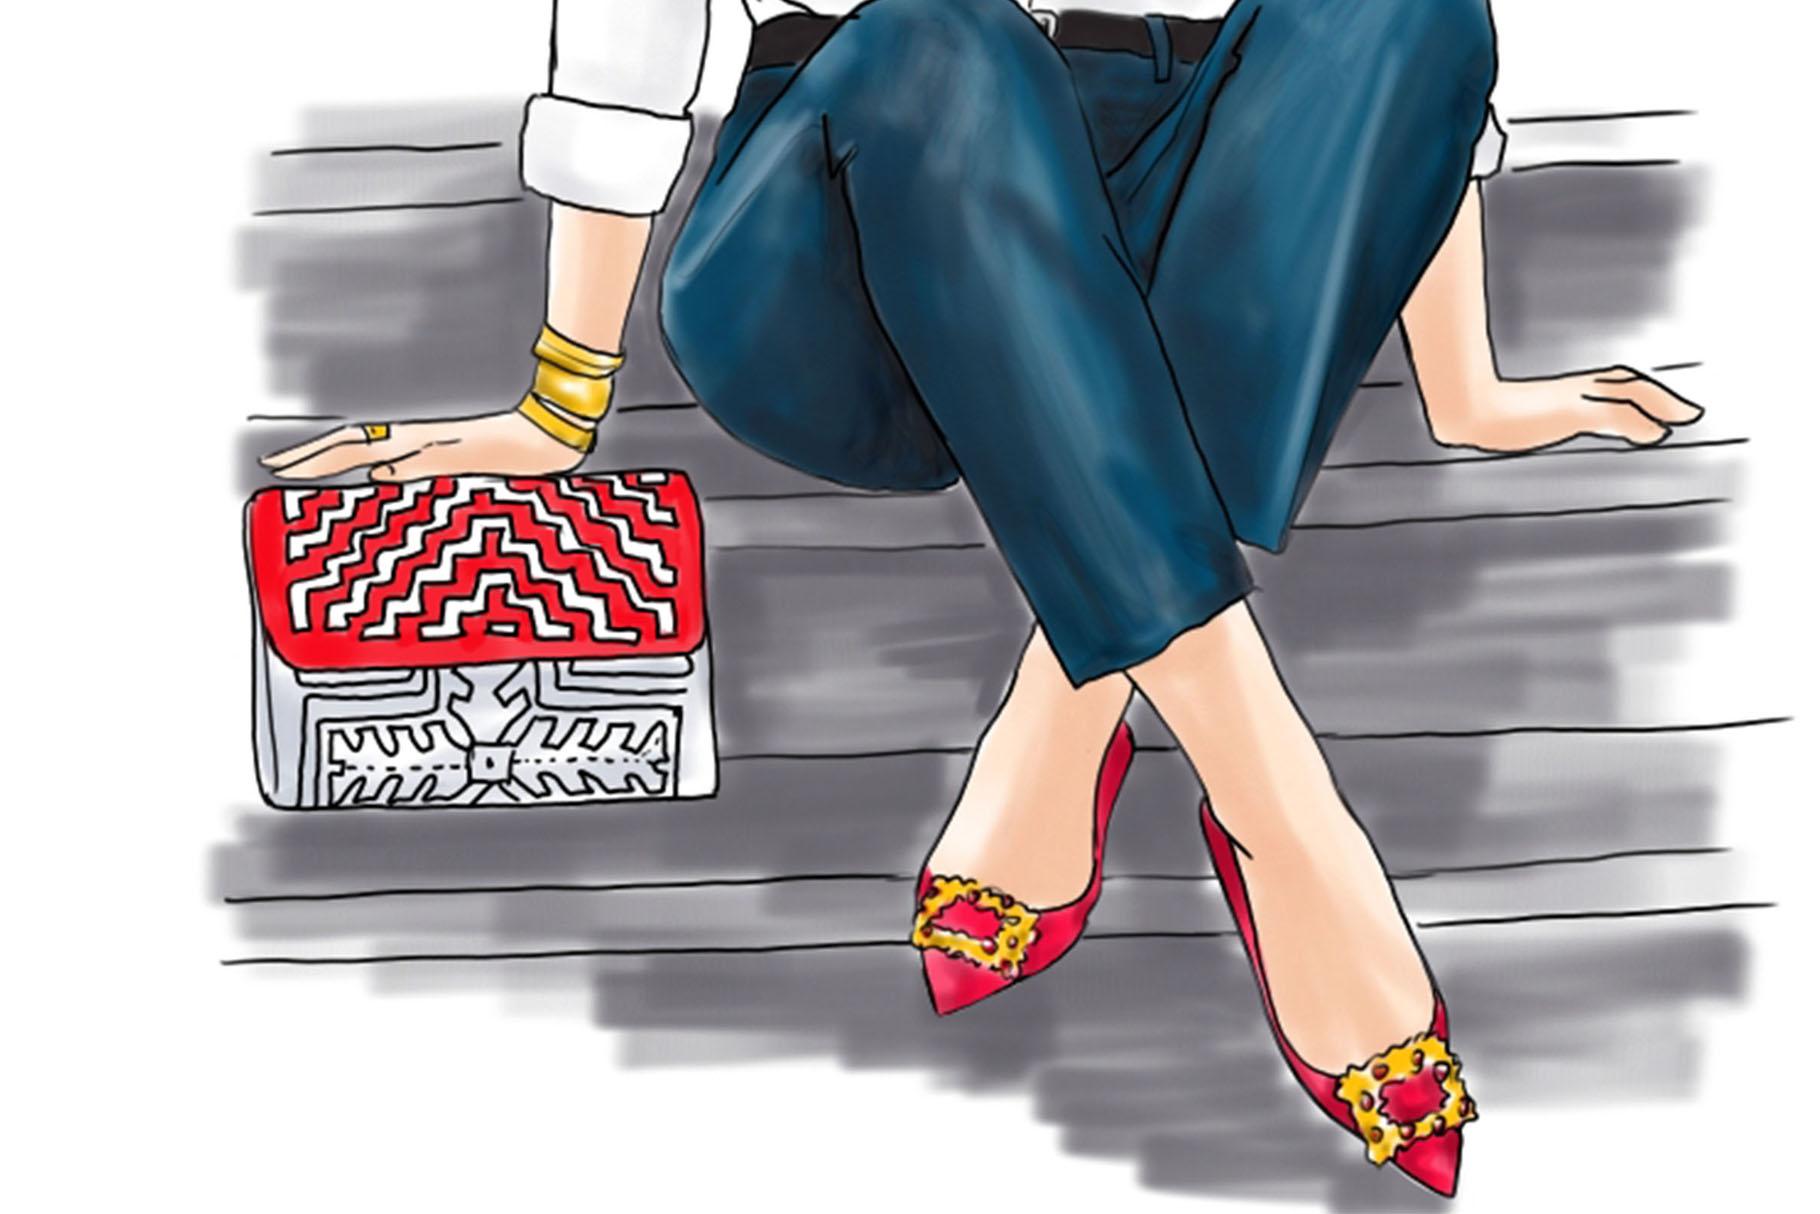 Fashion illustration - Girl in White Shirt & Jeans - Light example image 3